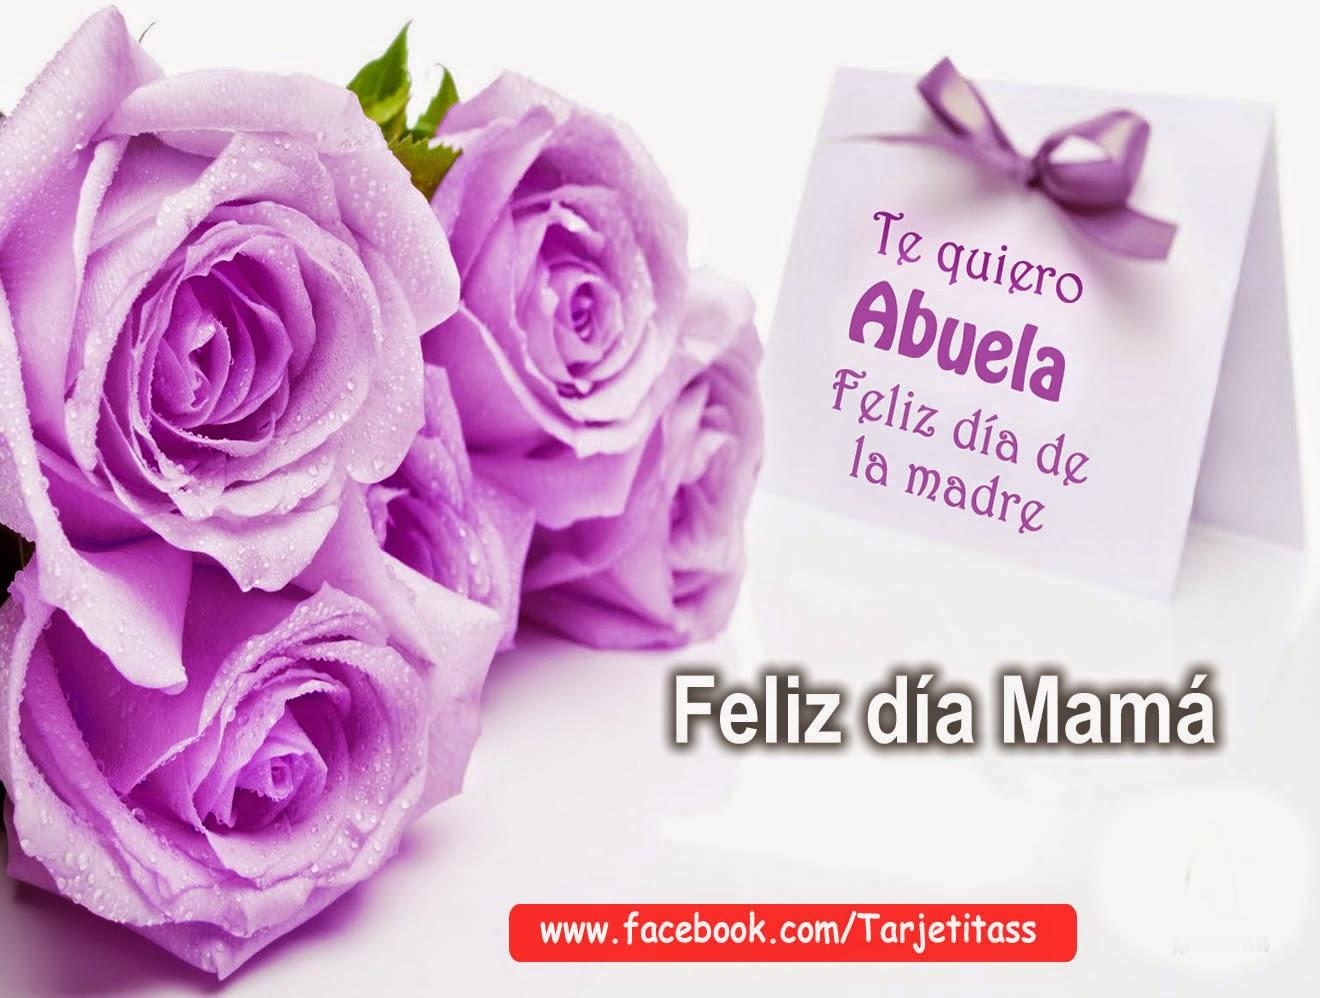 Gracias Madre Poemas Poemas A Mamá  Gracias Mamá Por Estar Siempre A Mi Lado